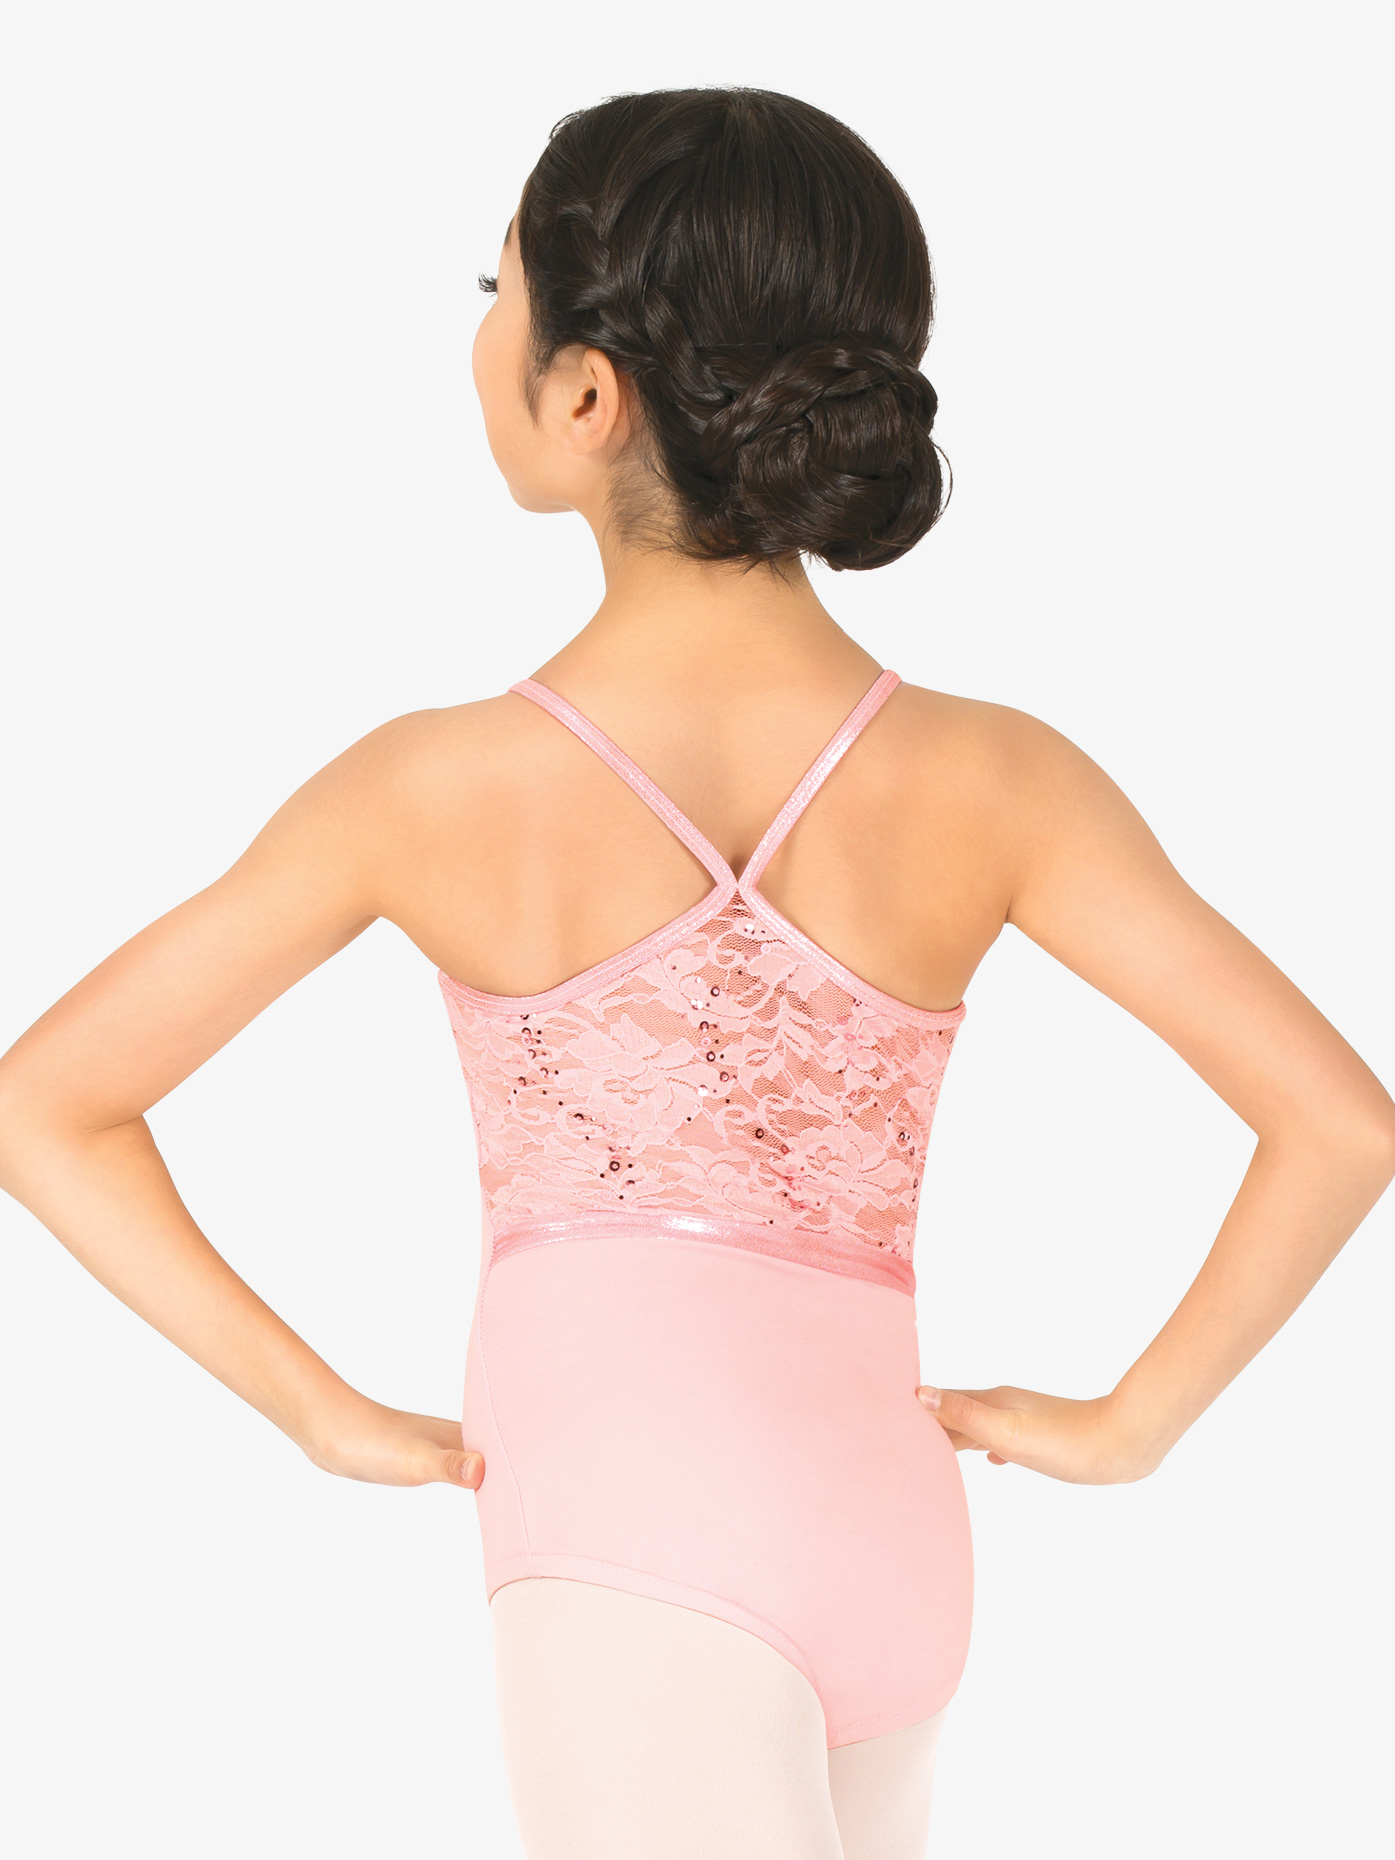 La Petite Ballerina Girls Sequin Lace Camisole Leotard PB2035C